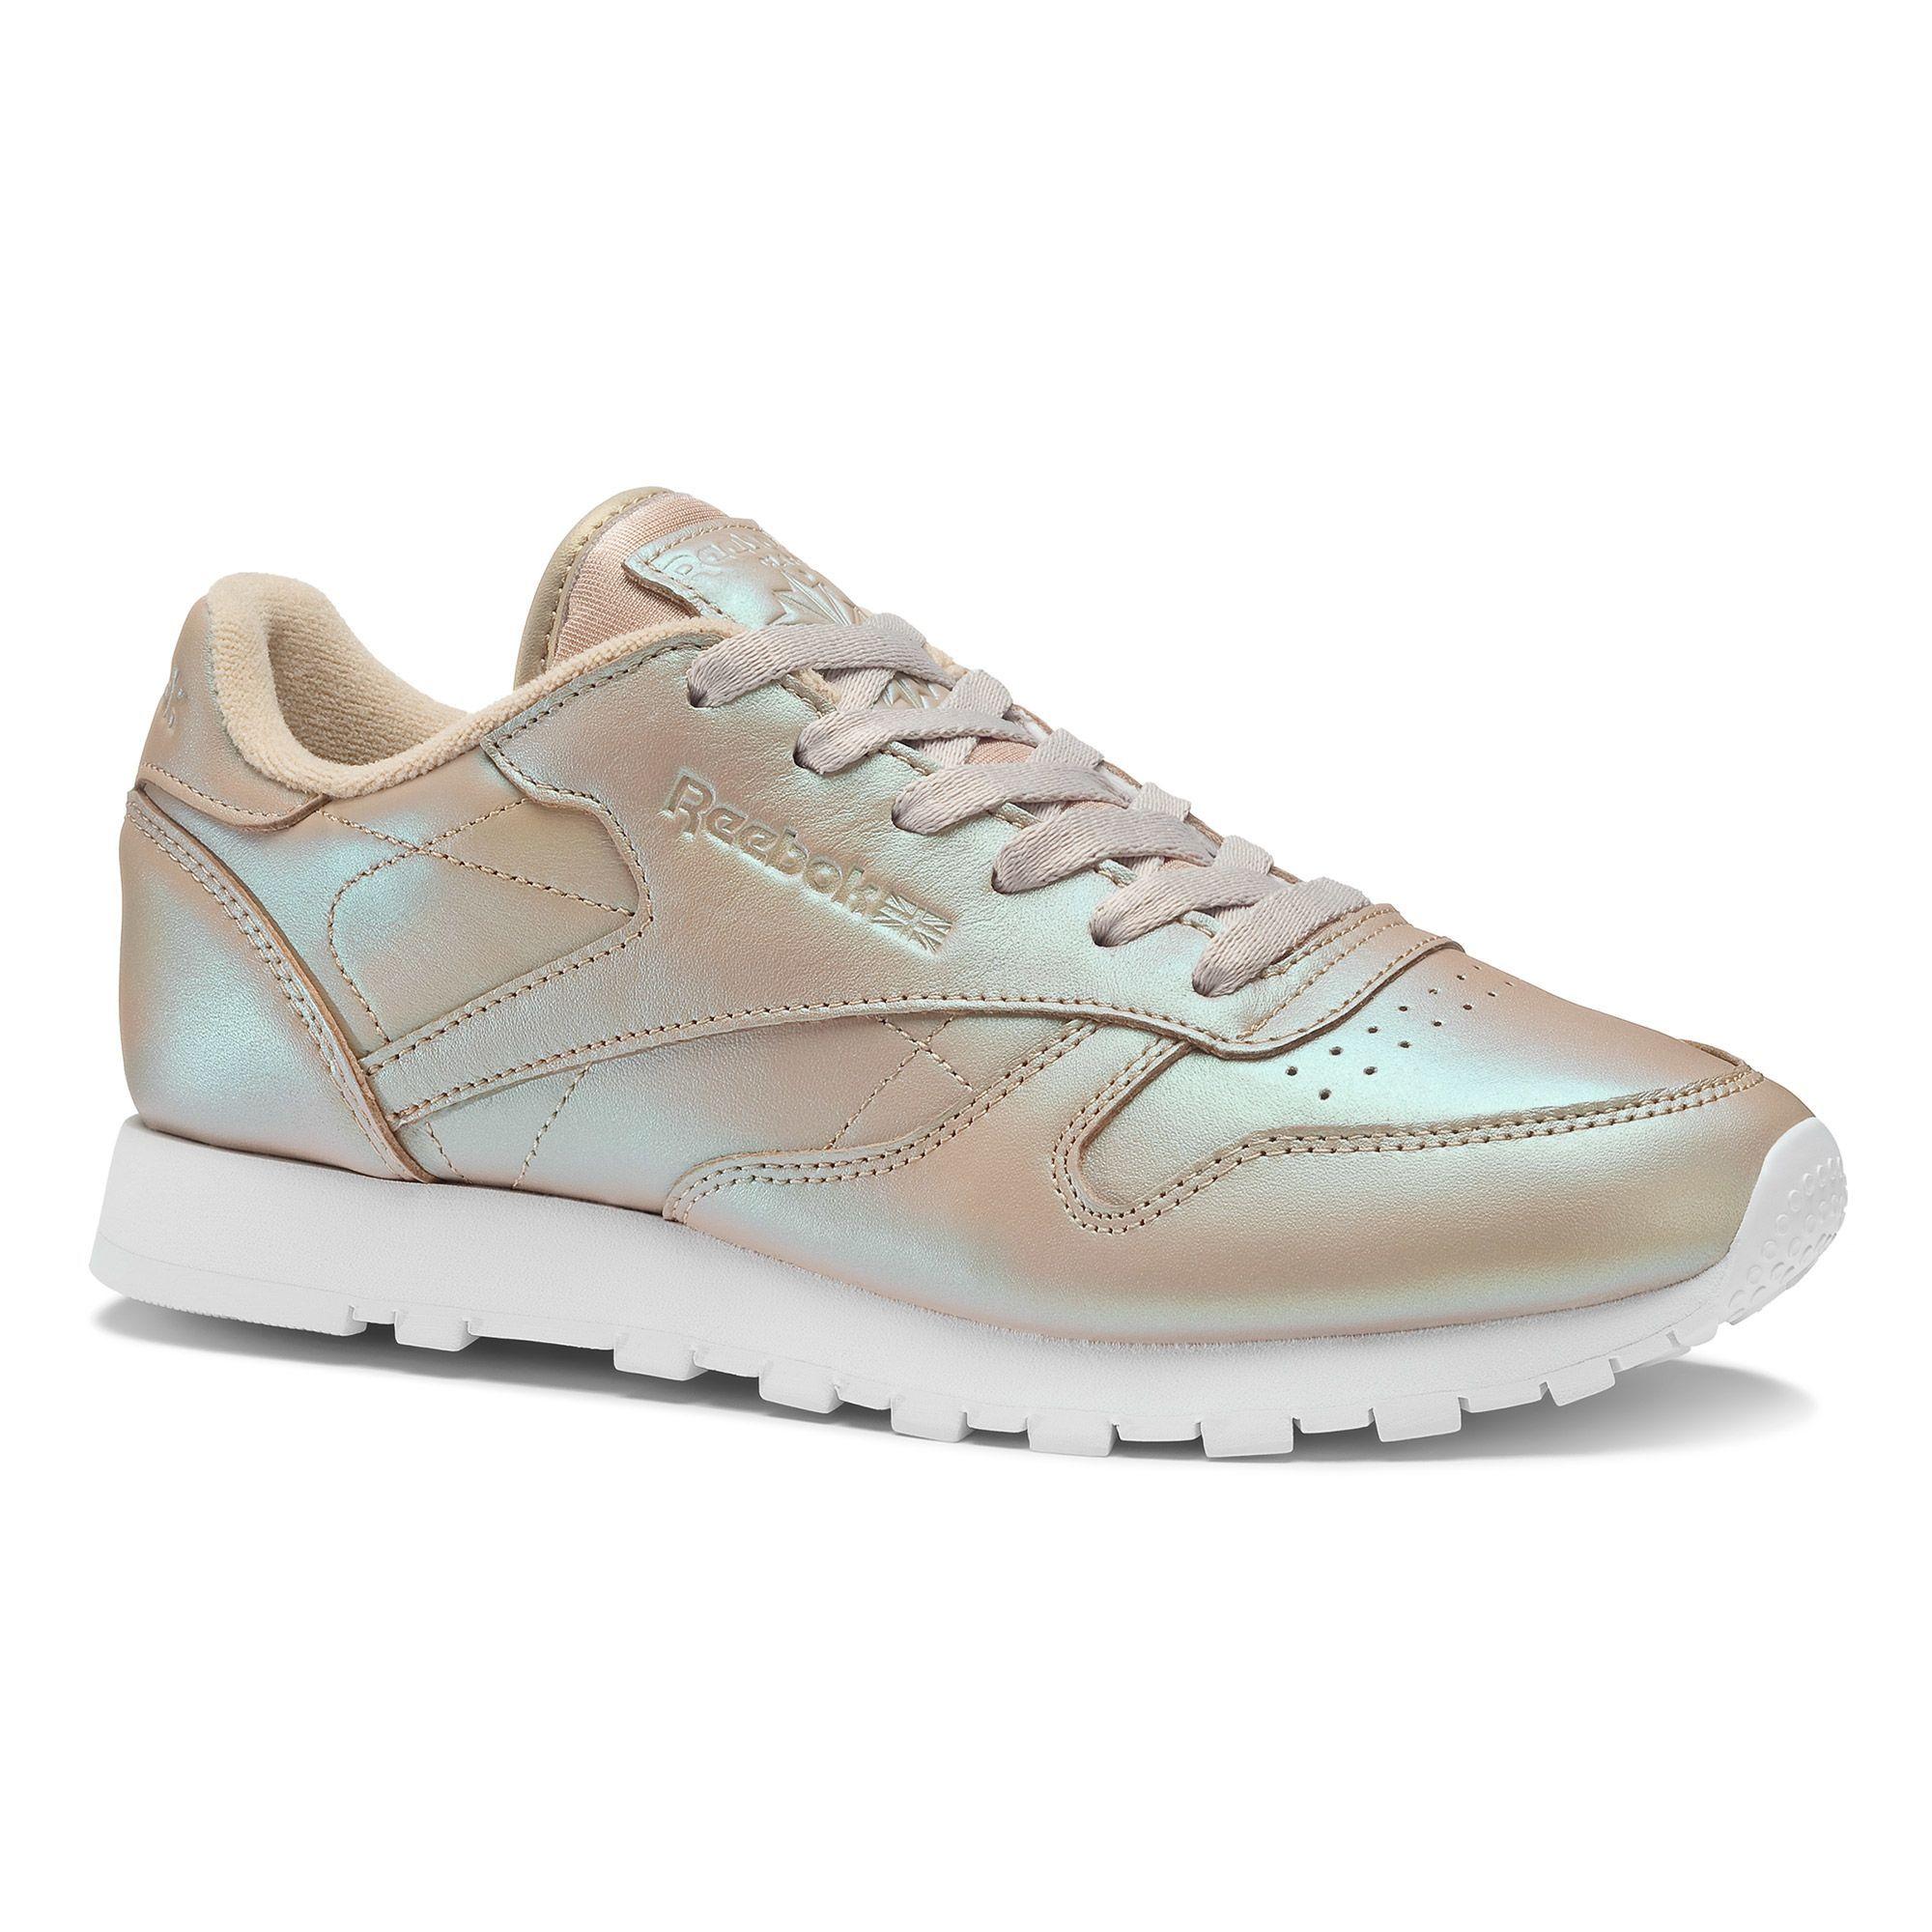 Novio Estrictamente donde quiera  Reebok - Classic Leather Pearlized | Chic shoes, Hiking shoes women, Shiny  shoes